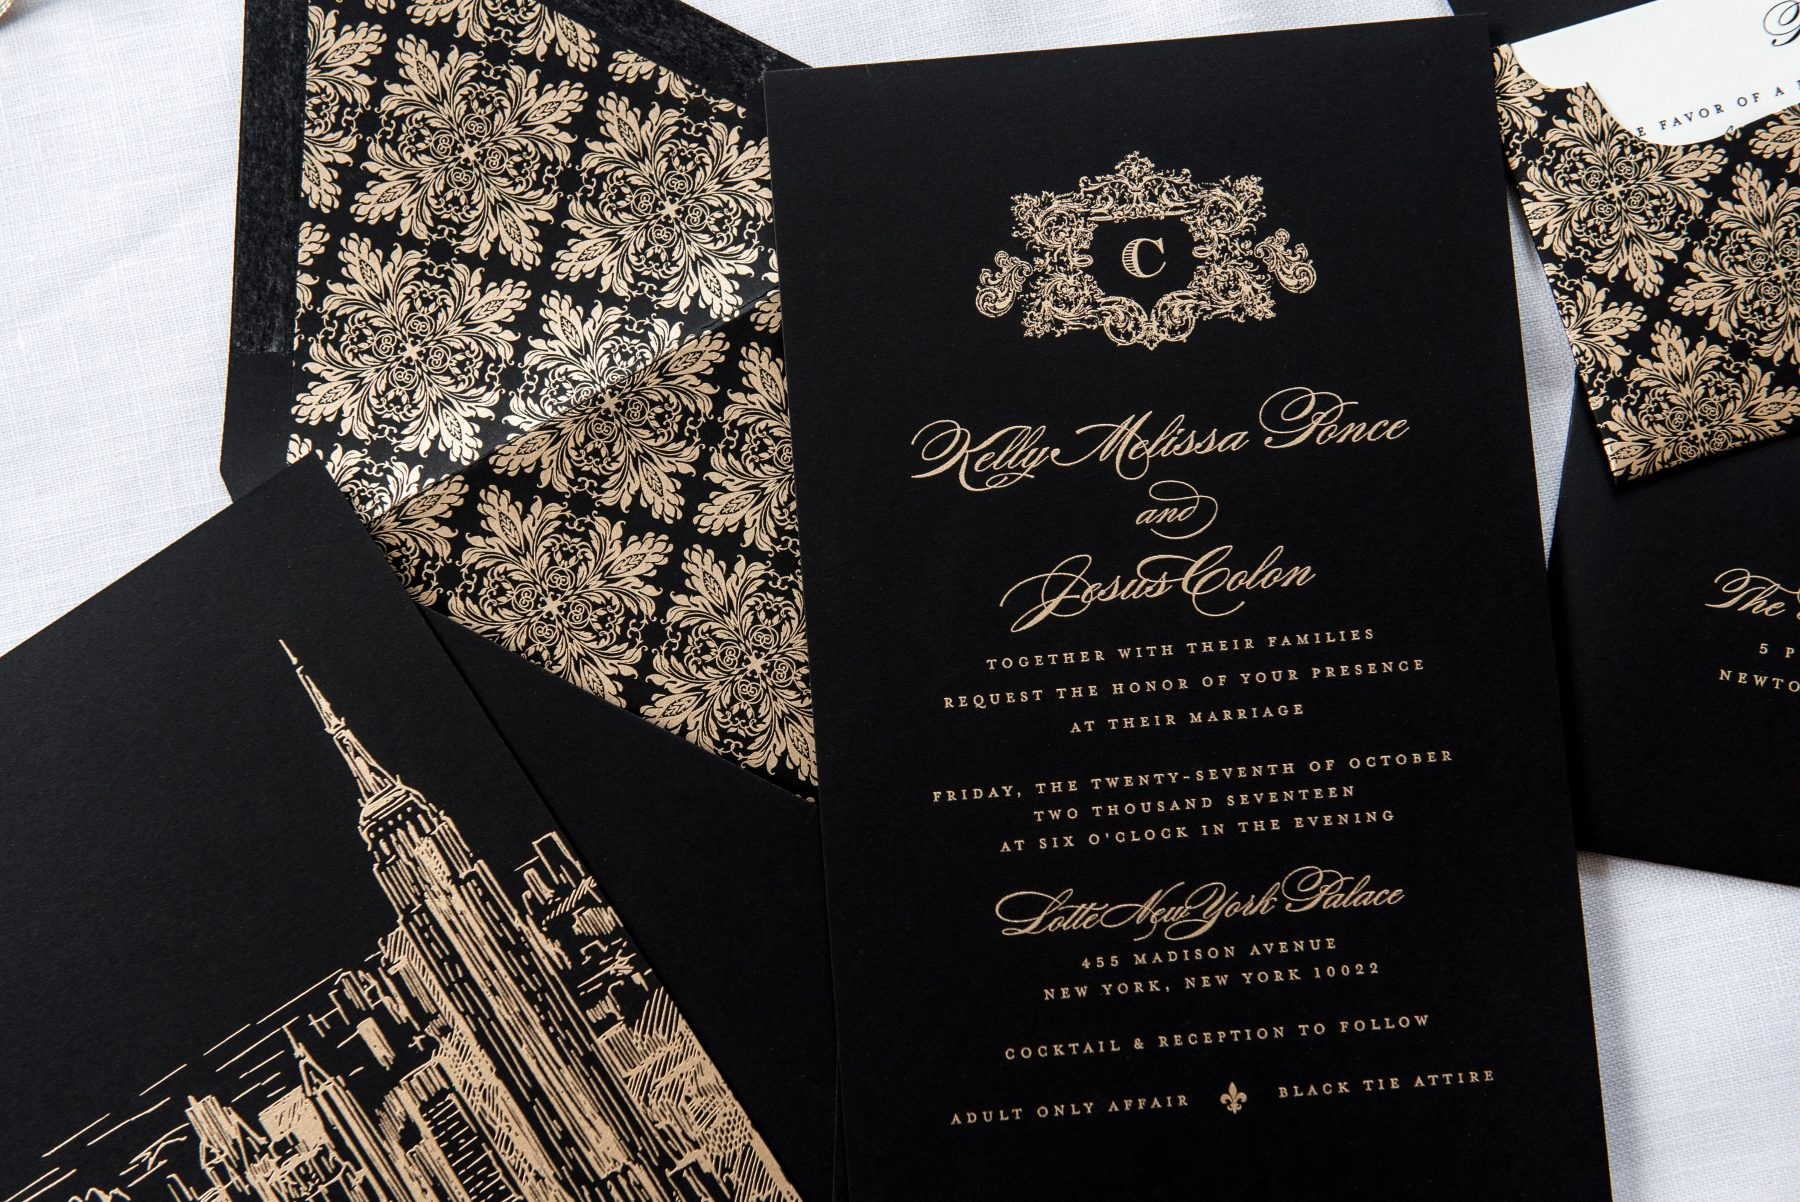 Wedding decorations royal blue october 2018 Ebony Lacy ebonylacy on Pinterest